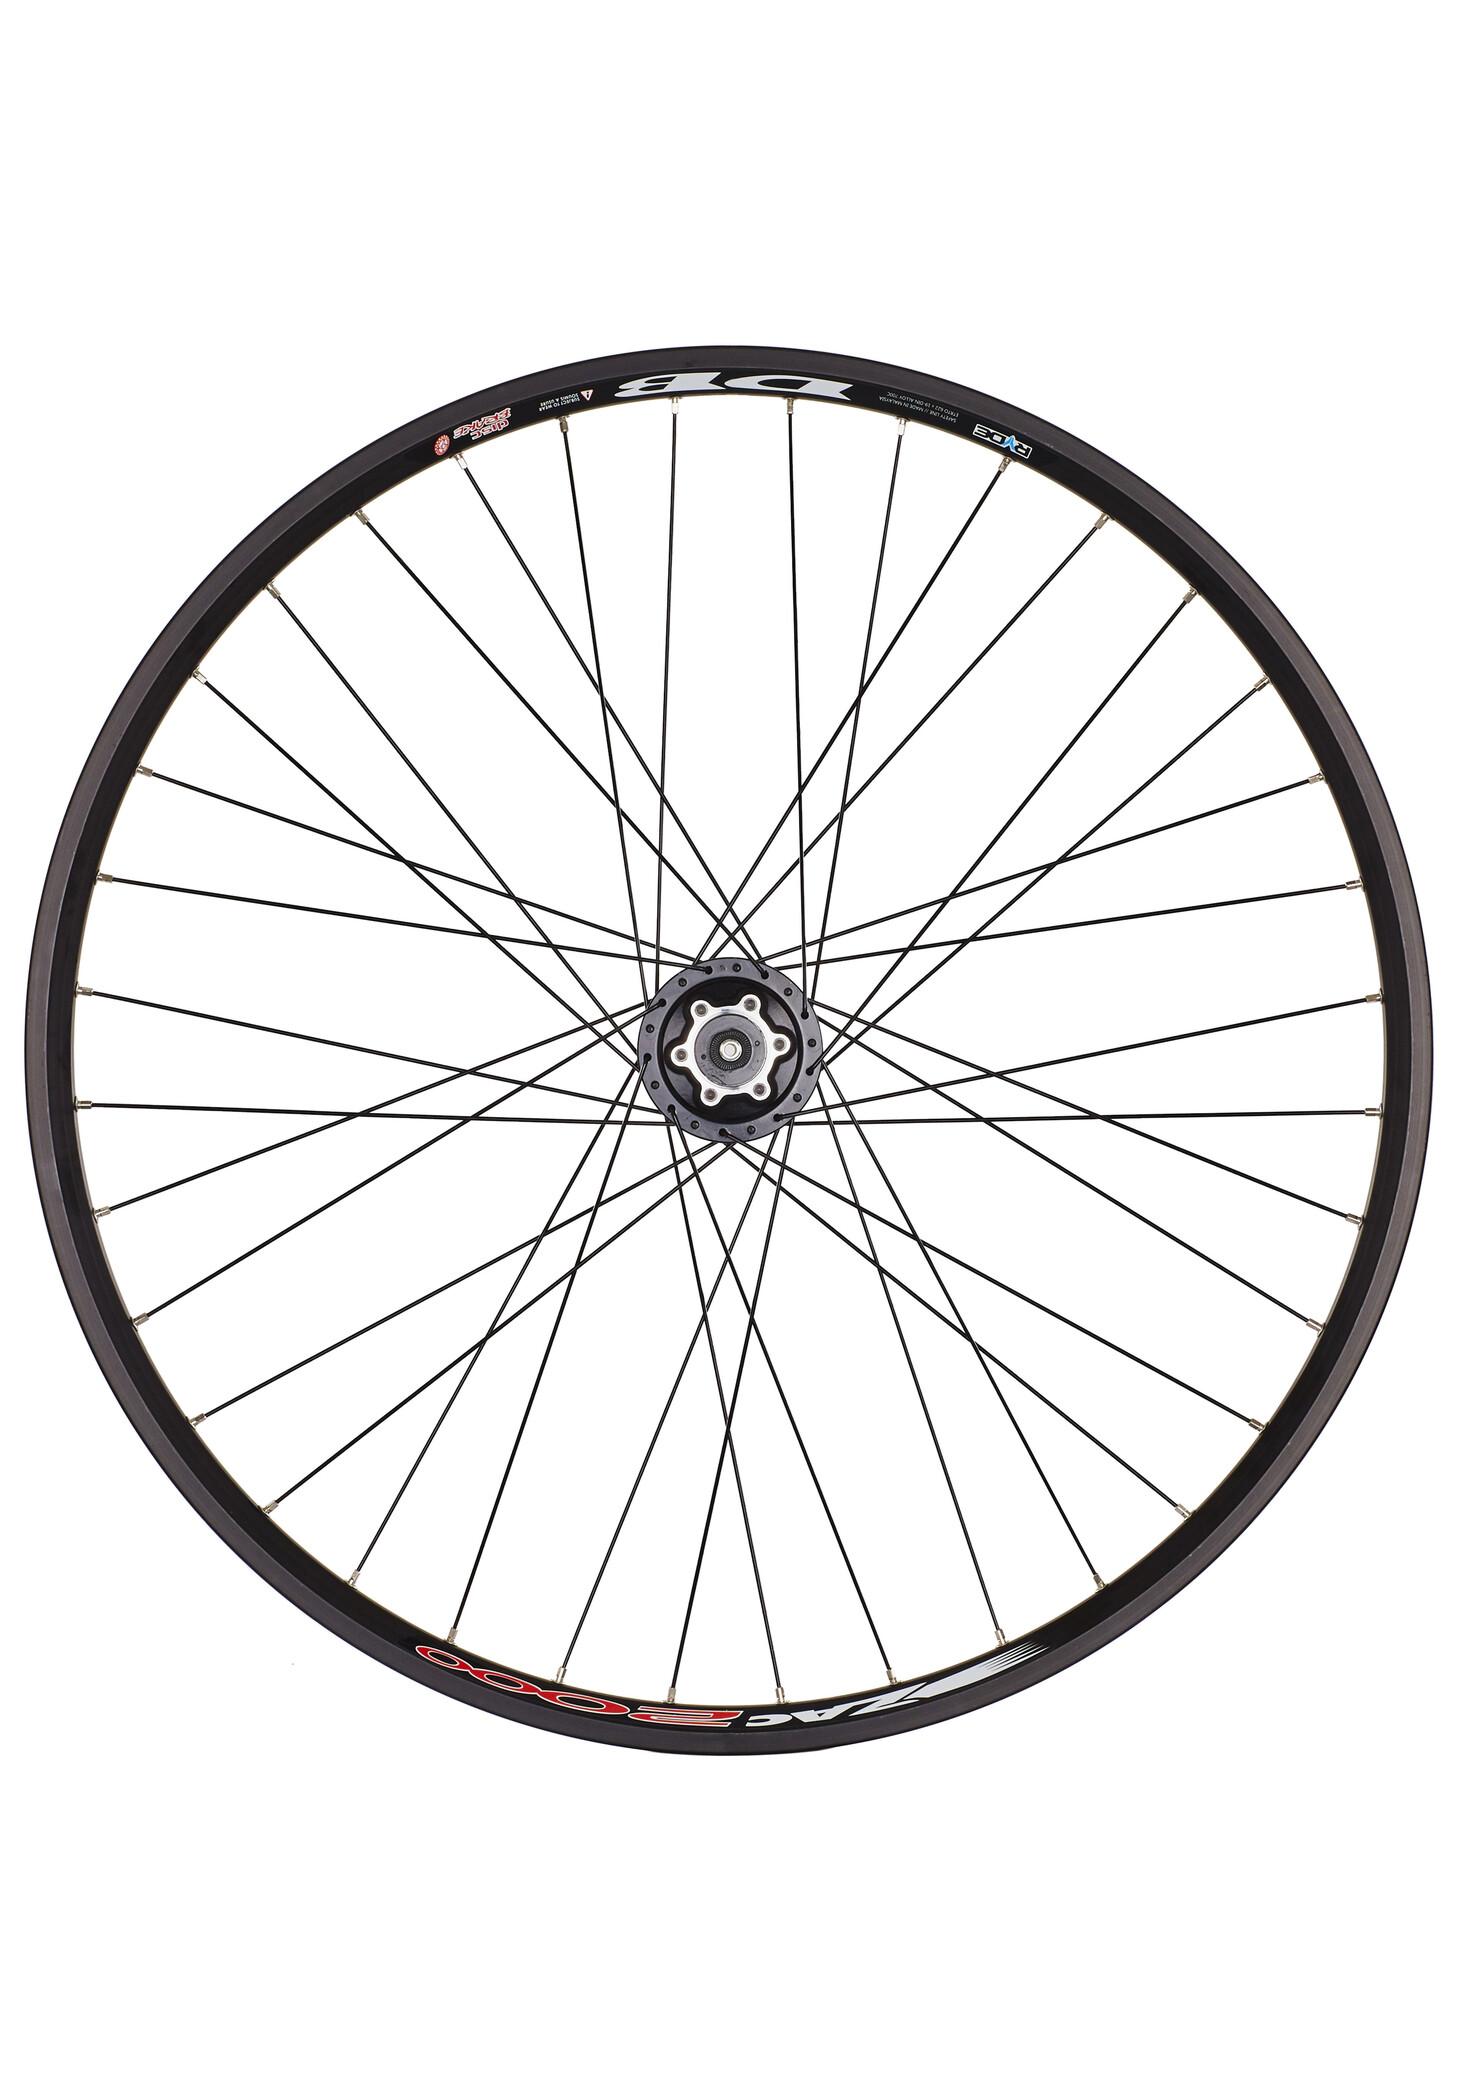 28/´/´ Rigida X-Star 19 Fahrrad Felge Schwarz //// 622-19 Ryde